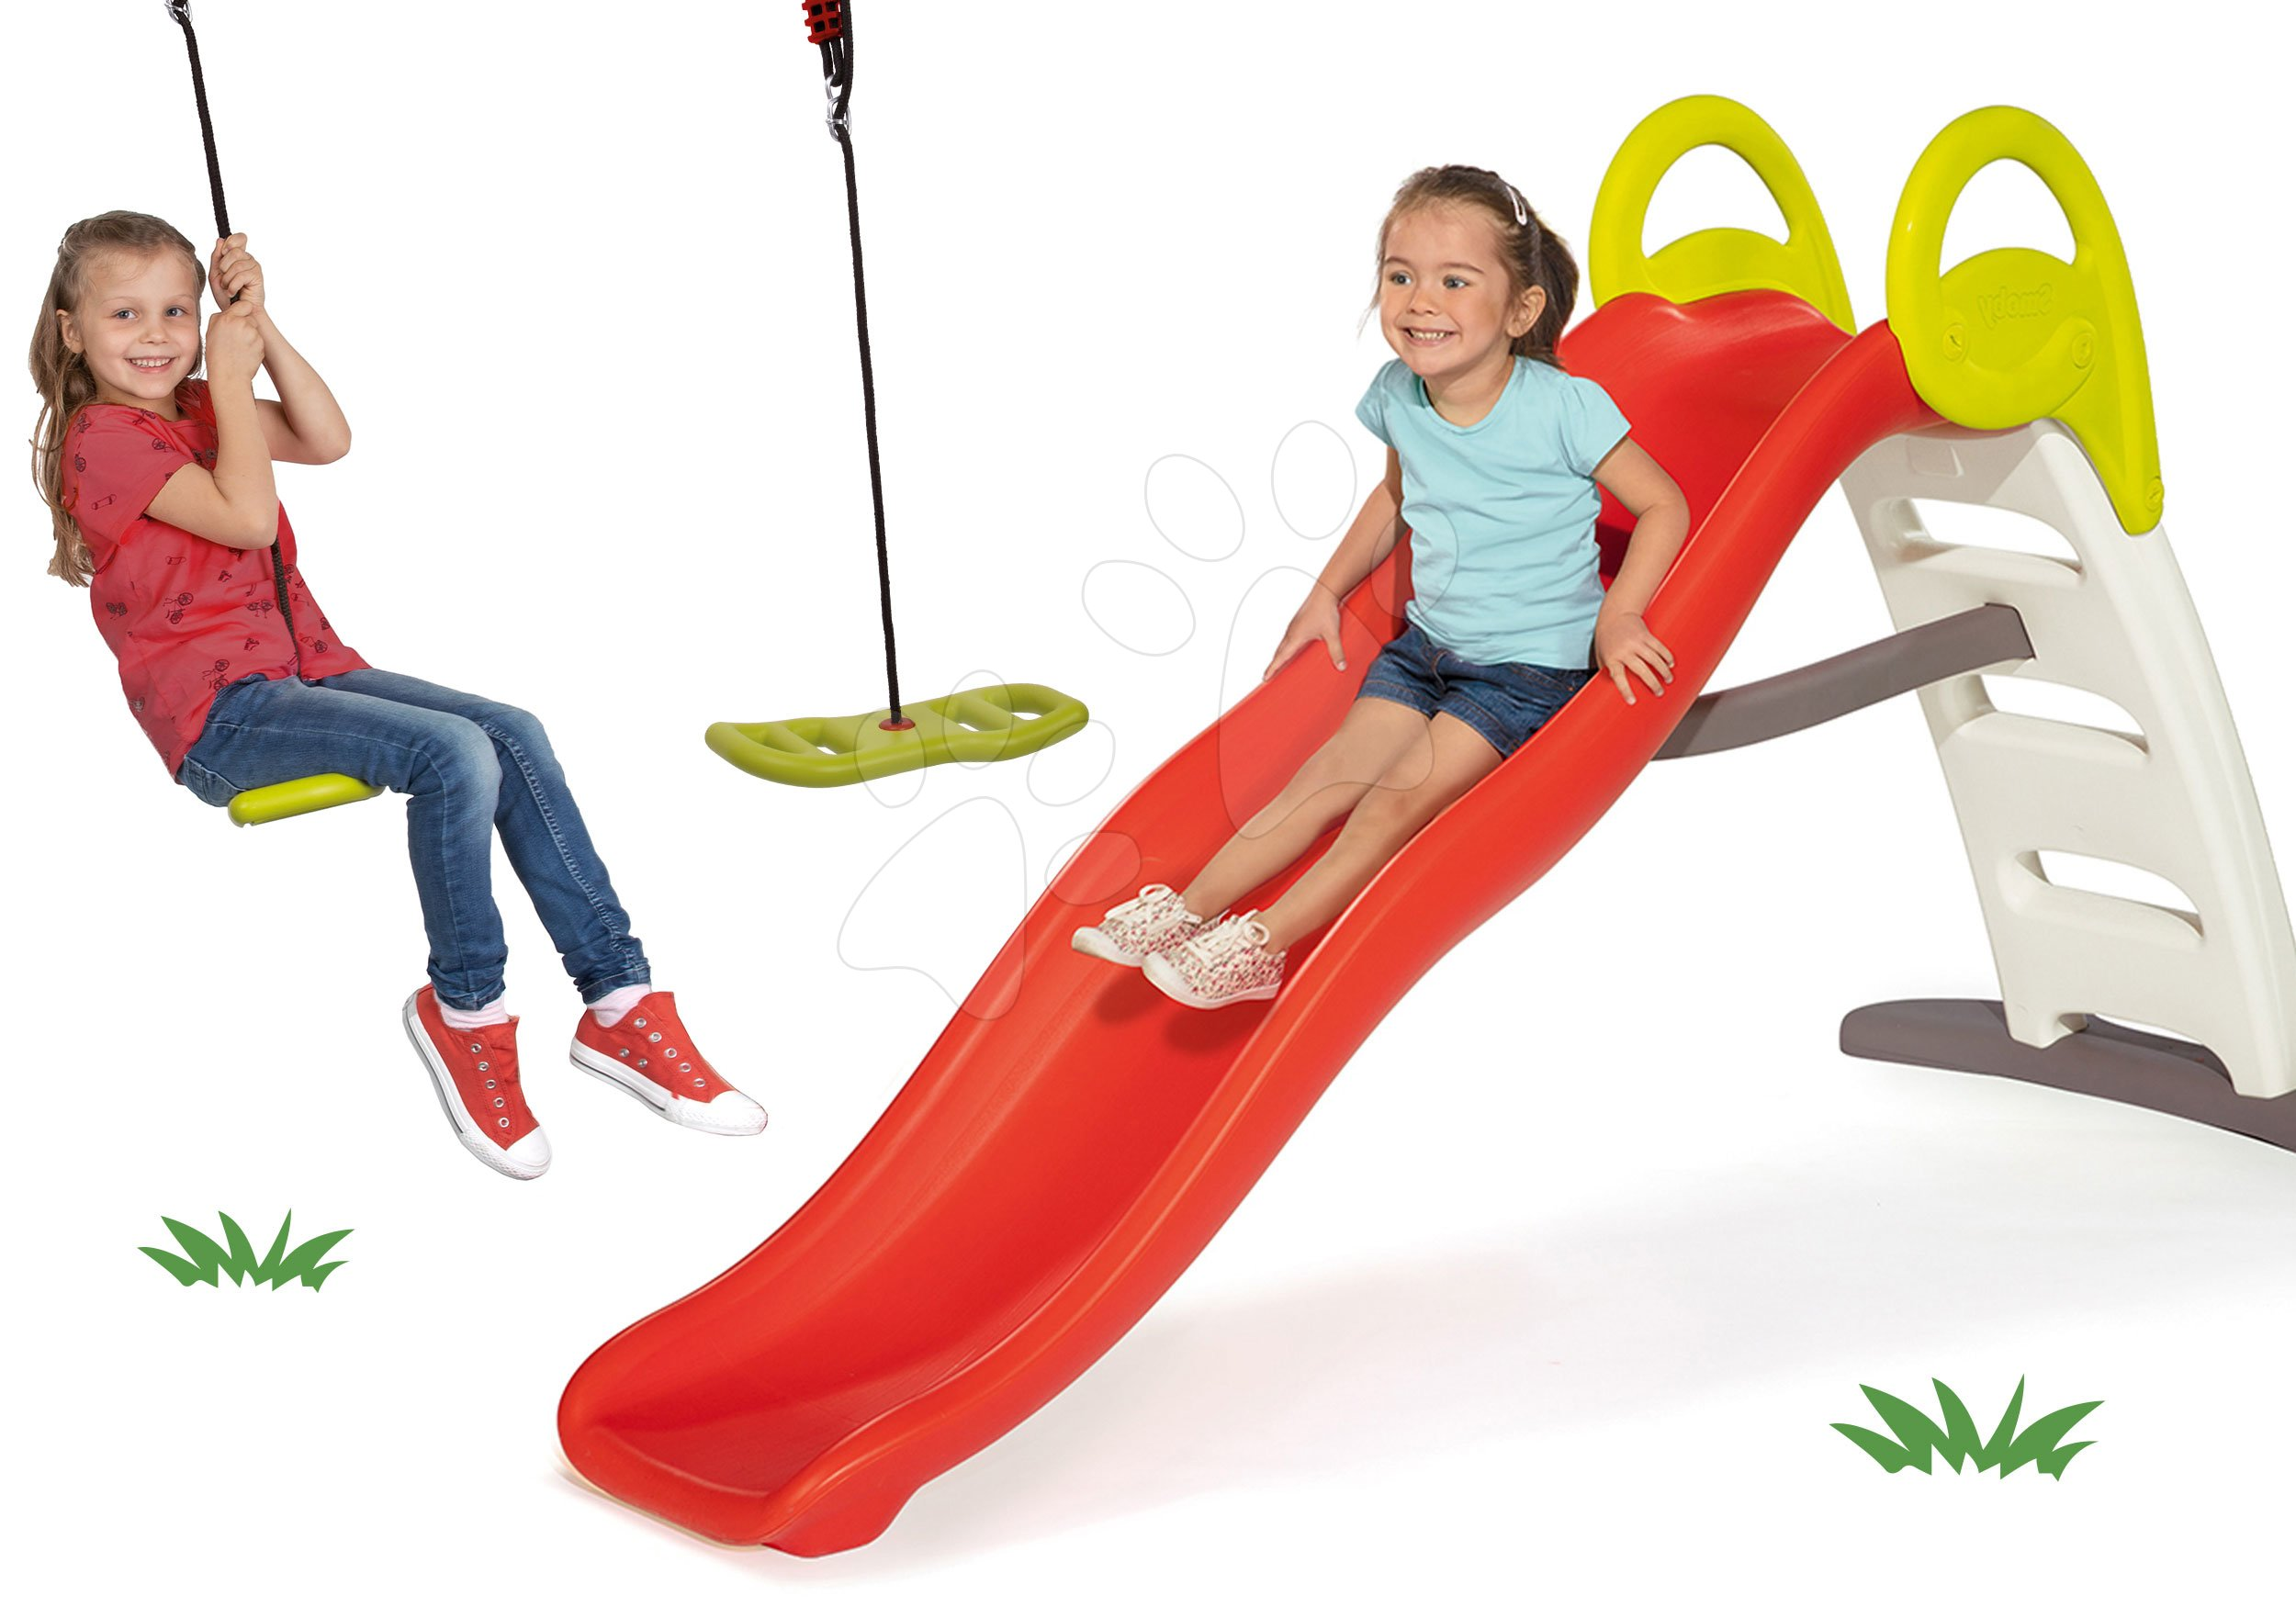 Set šmykľavka s vodotryskom Funny Double Toboggan 2 metrová Smoby a hojdačka Activity Swing